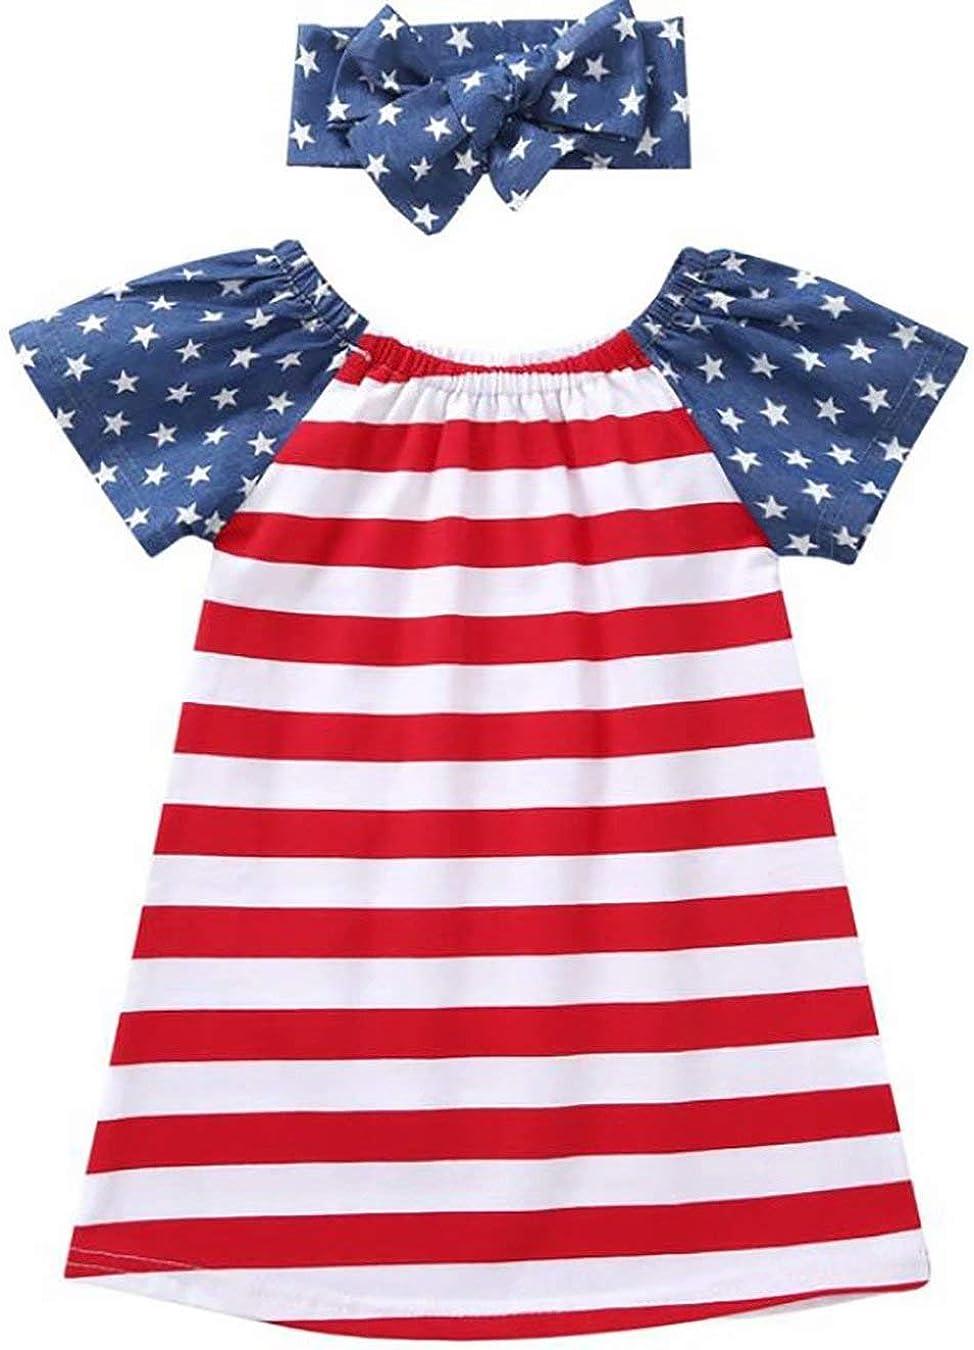 USA Flag Headband Summer Outfit Set KIDDAD Toddler Baby Girls American Flag Stars Stripes Print Shirt Dresses